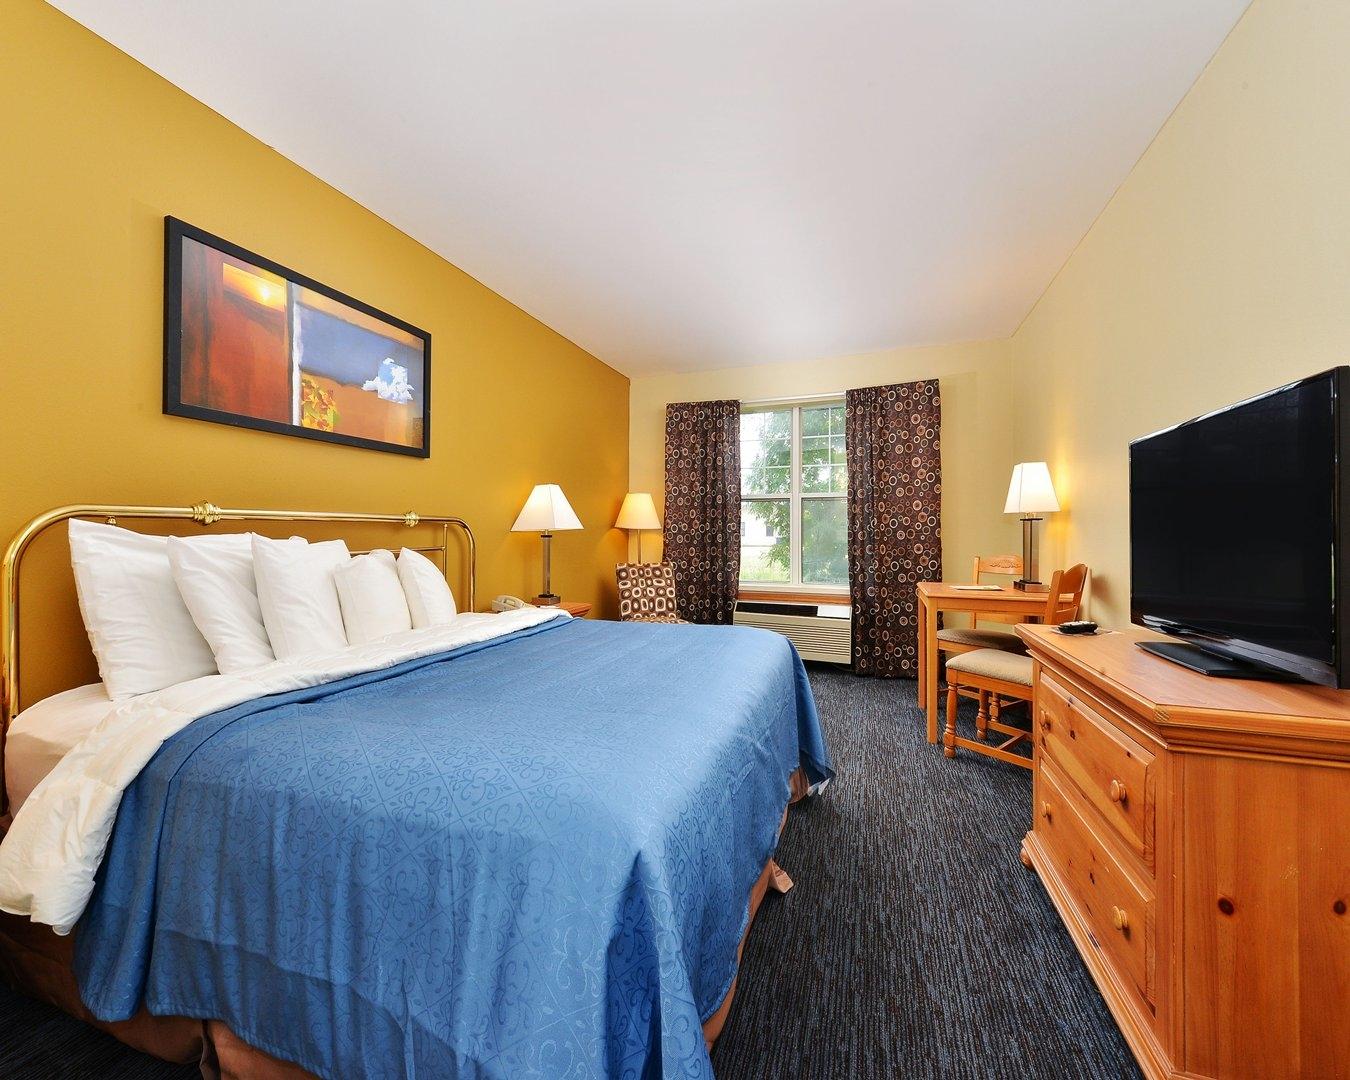 Quality Inn & Suites, Shawano WI